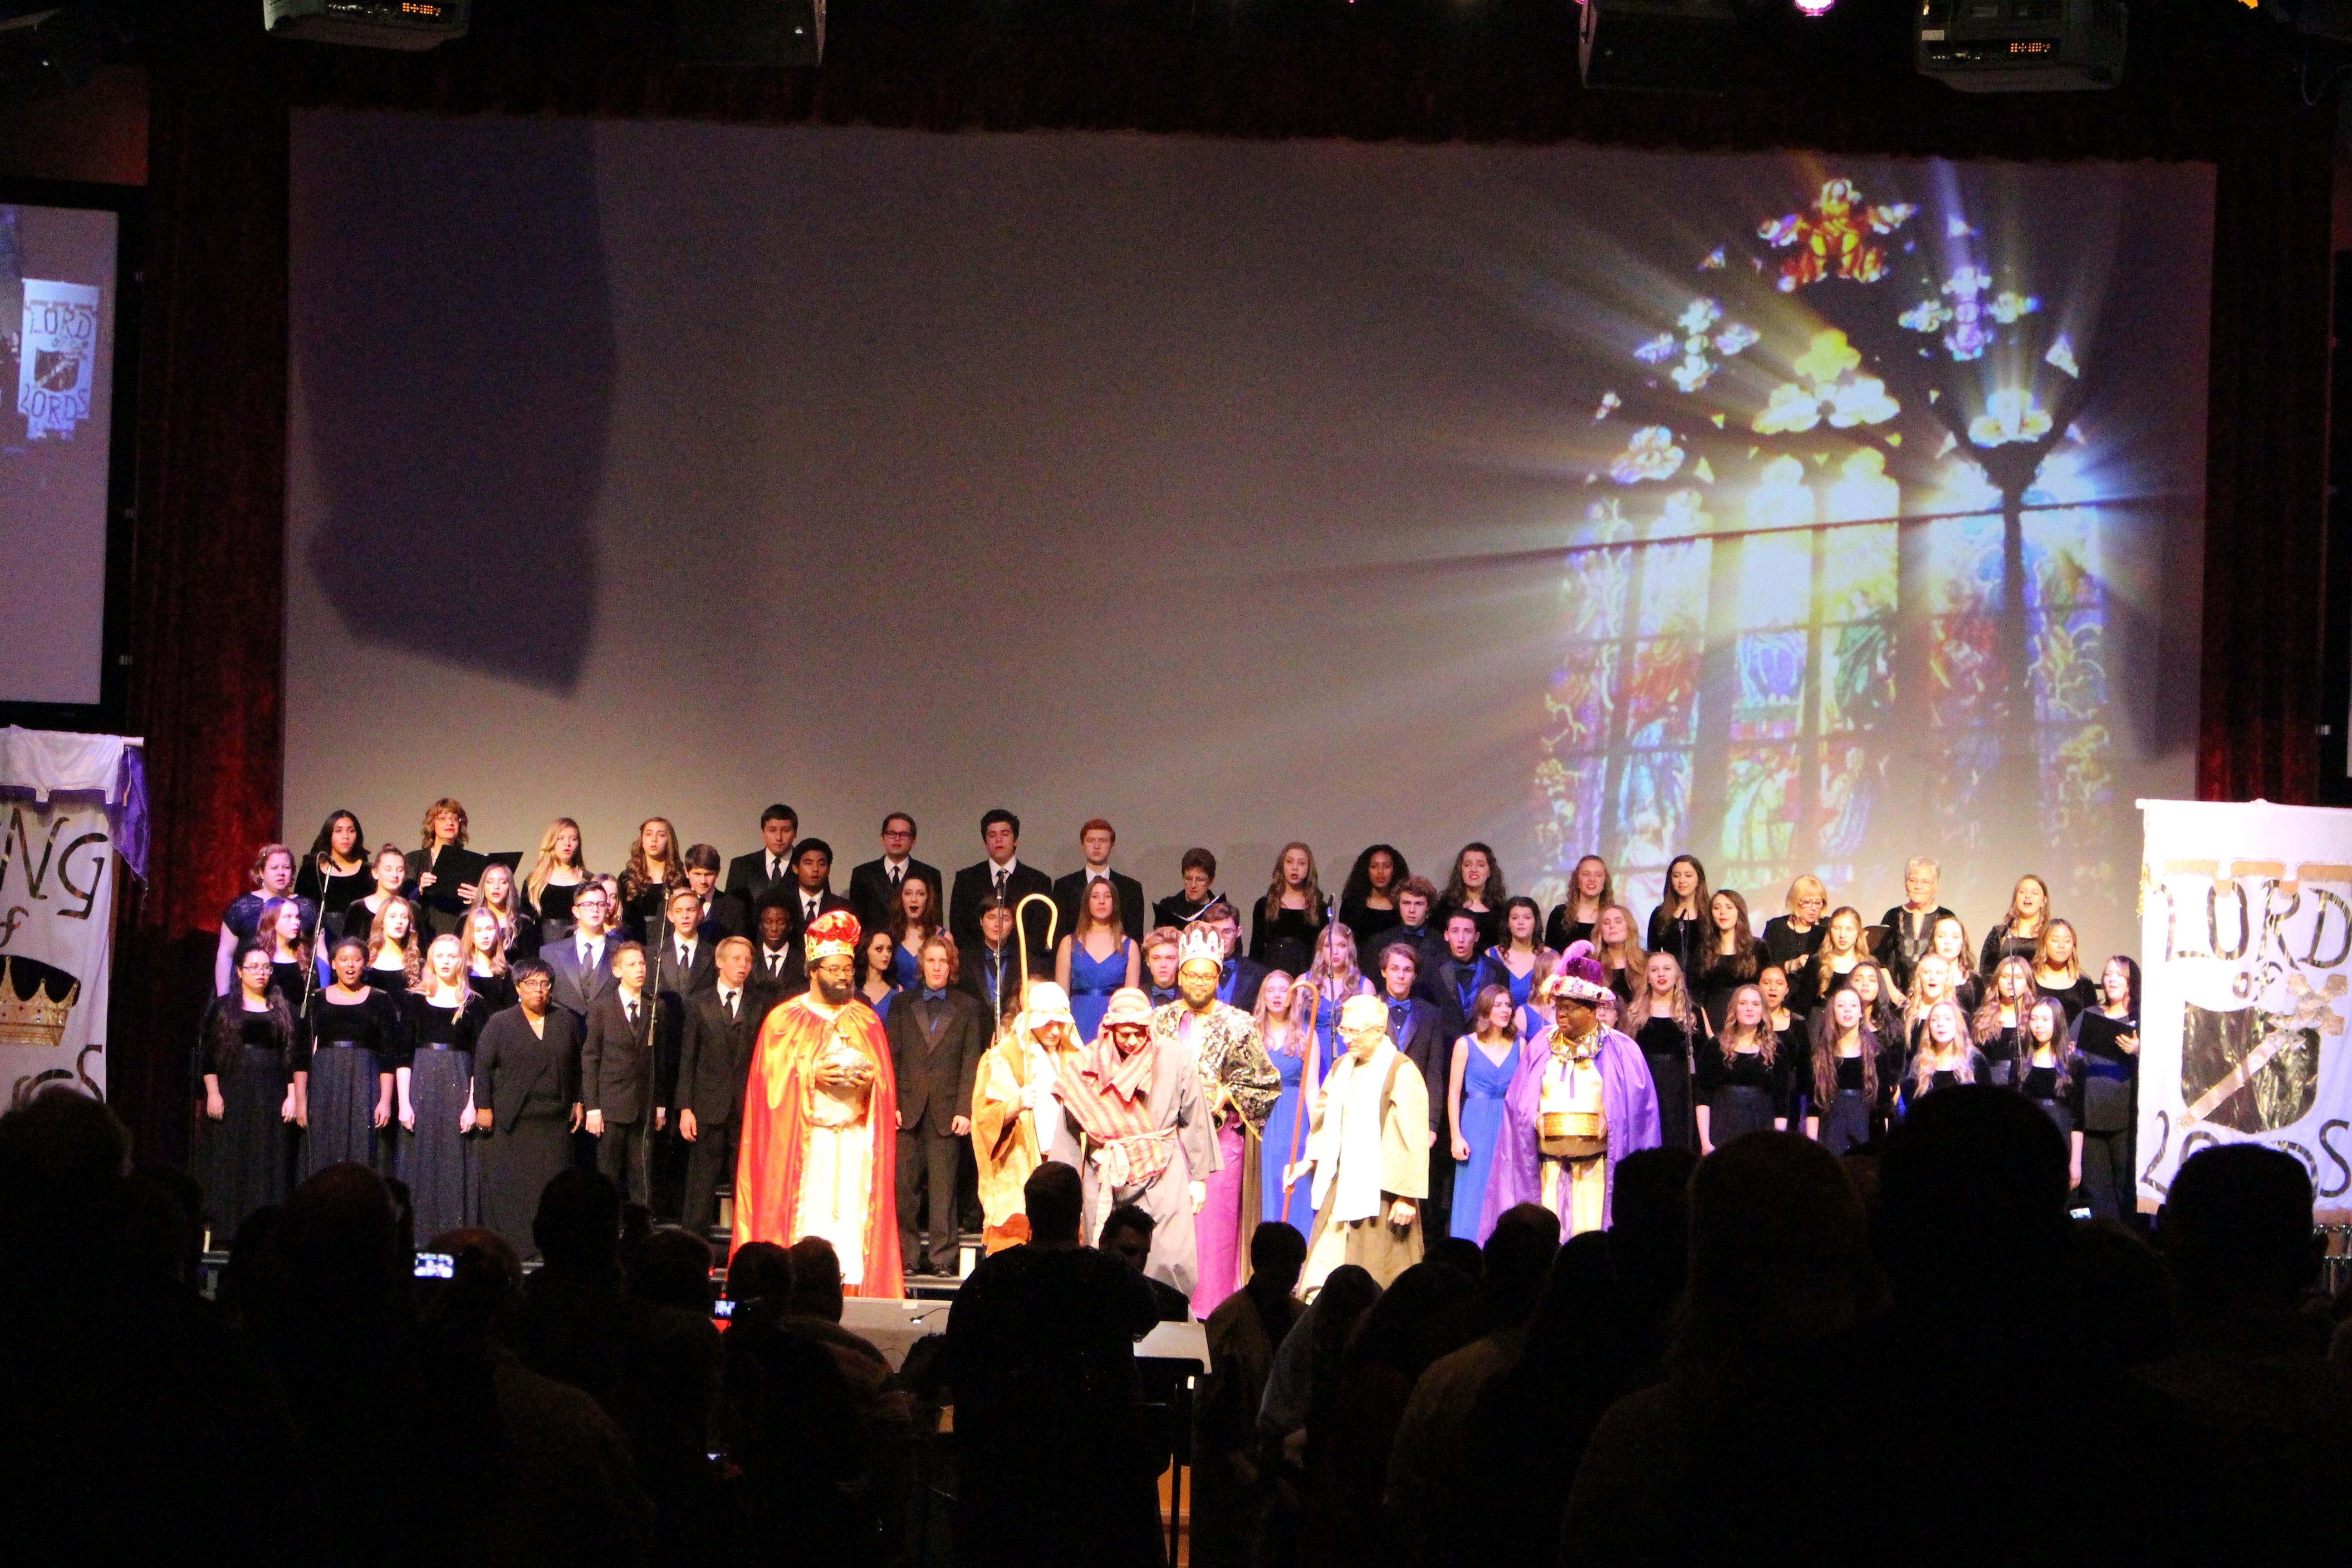 Valley Christian Christmas Extravaganza (Dec. 13)